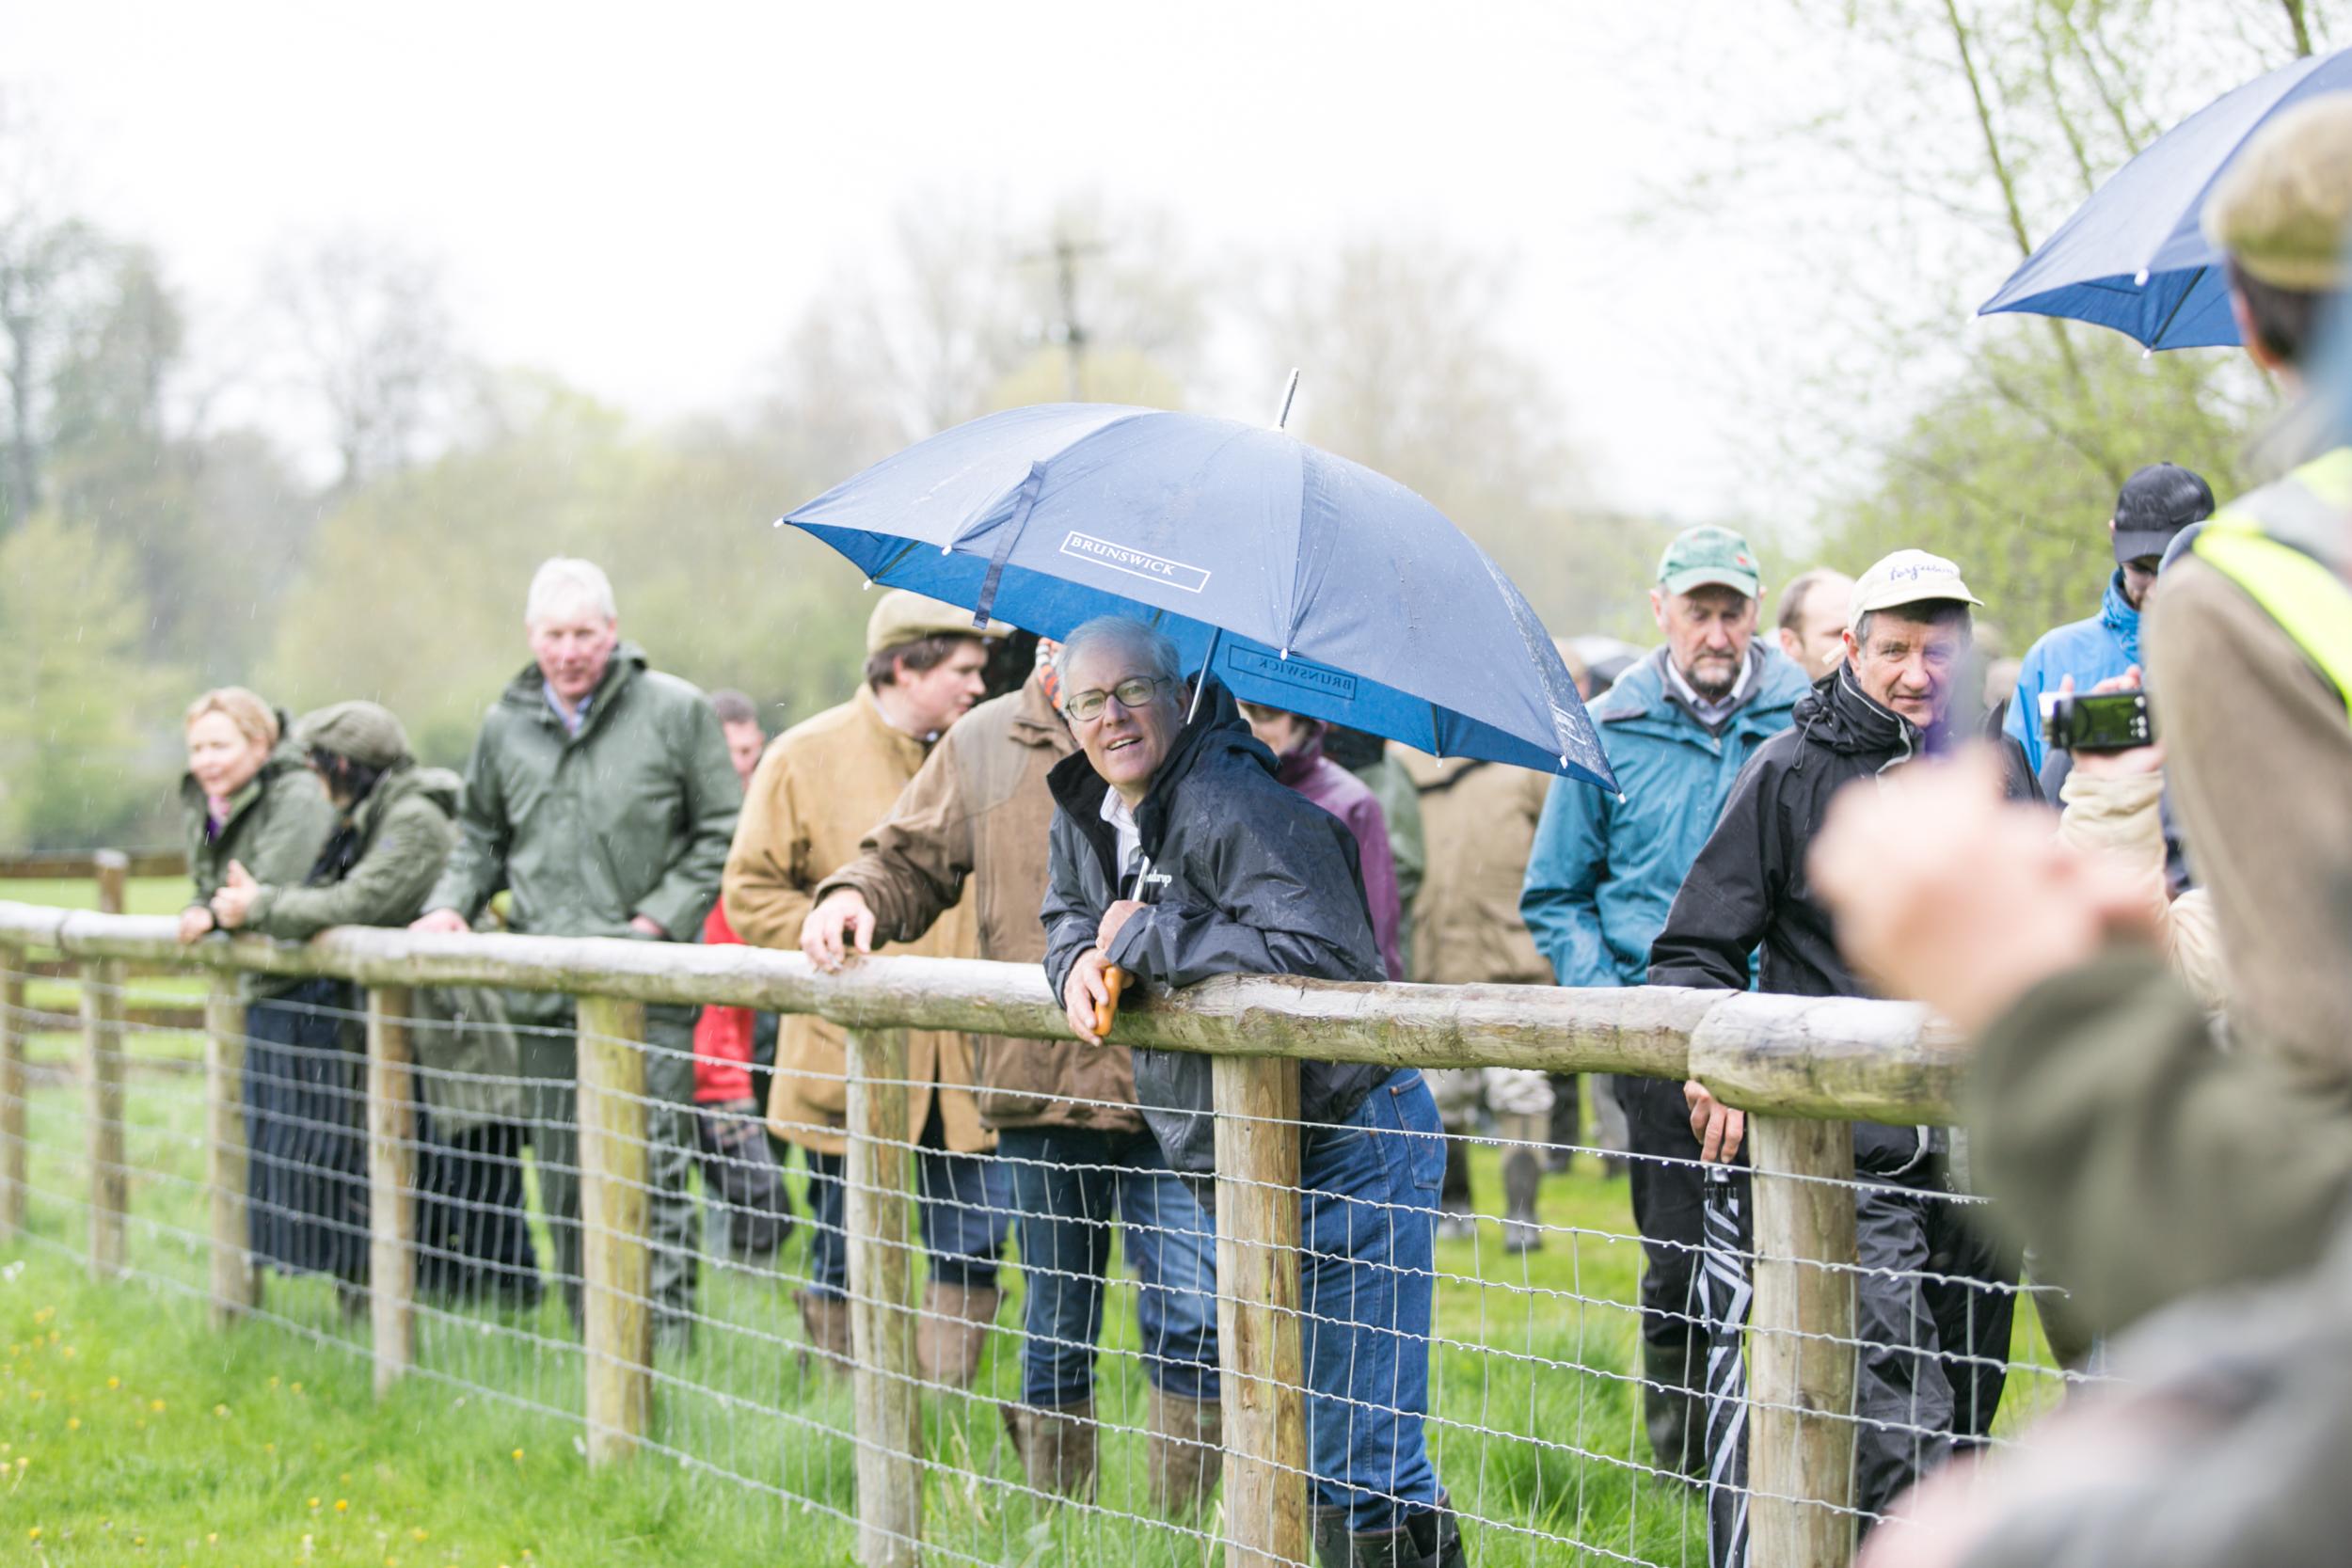 SFT_Future of UK Farming_Chloe Edwards-4619.jpg